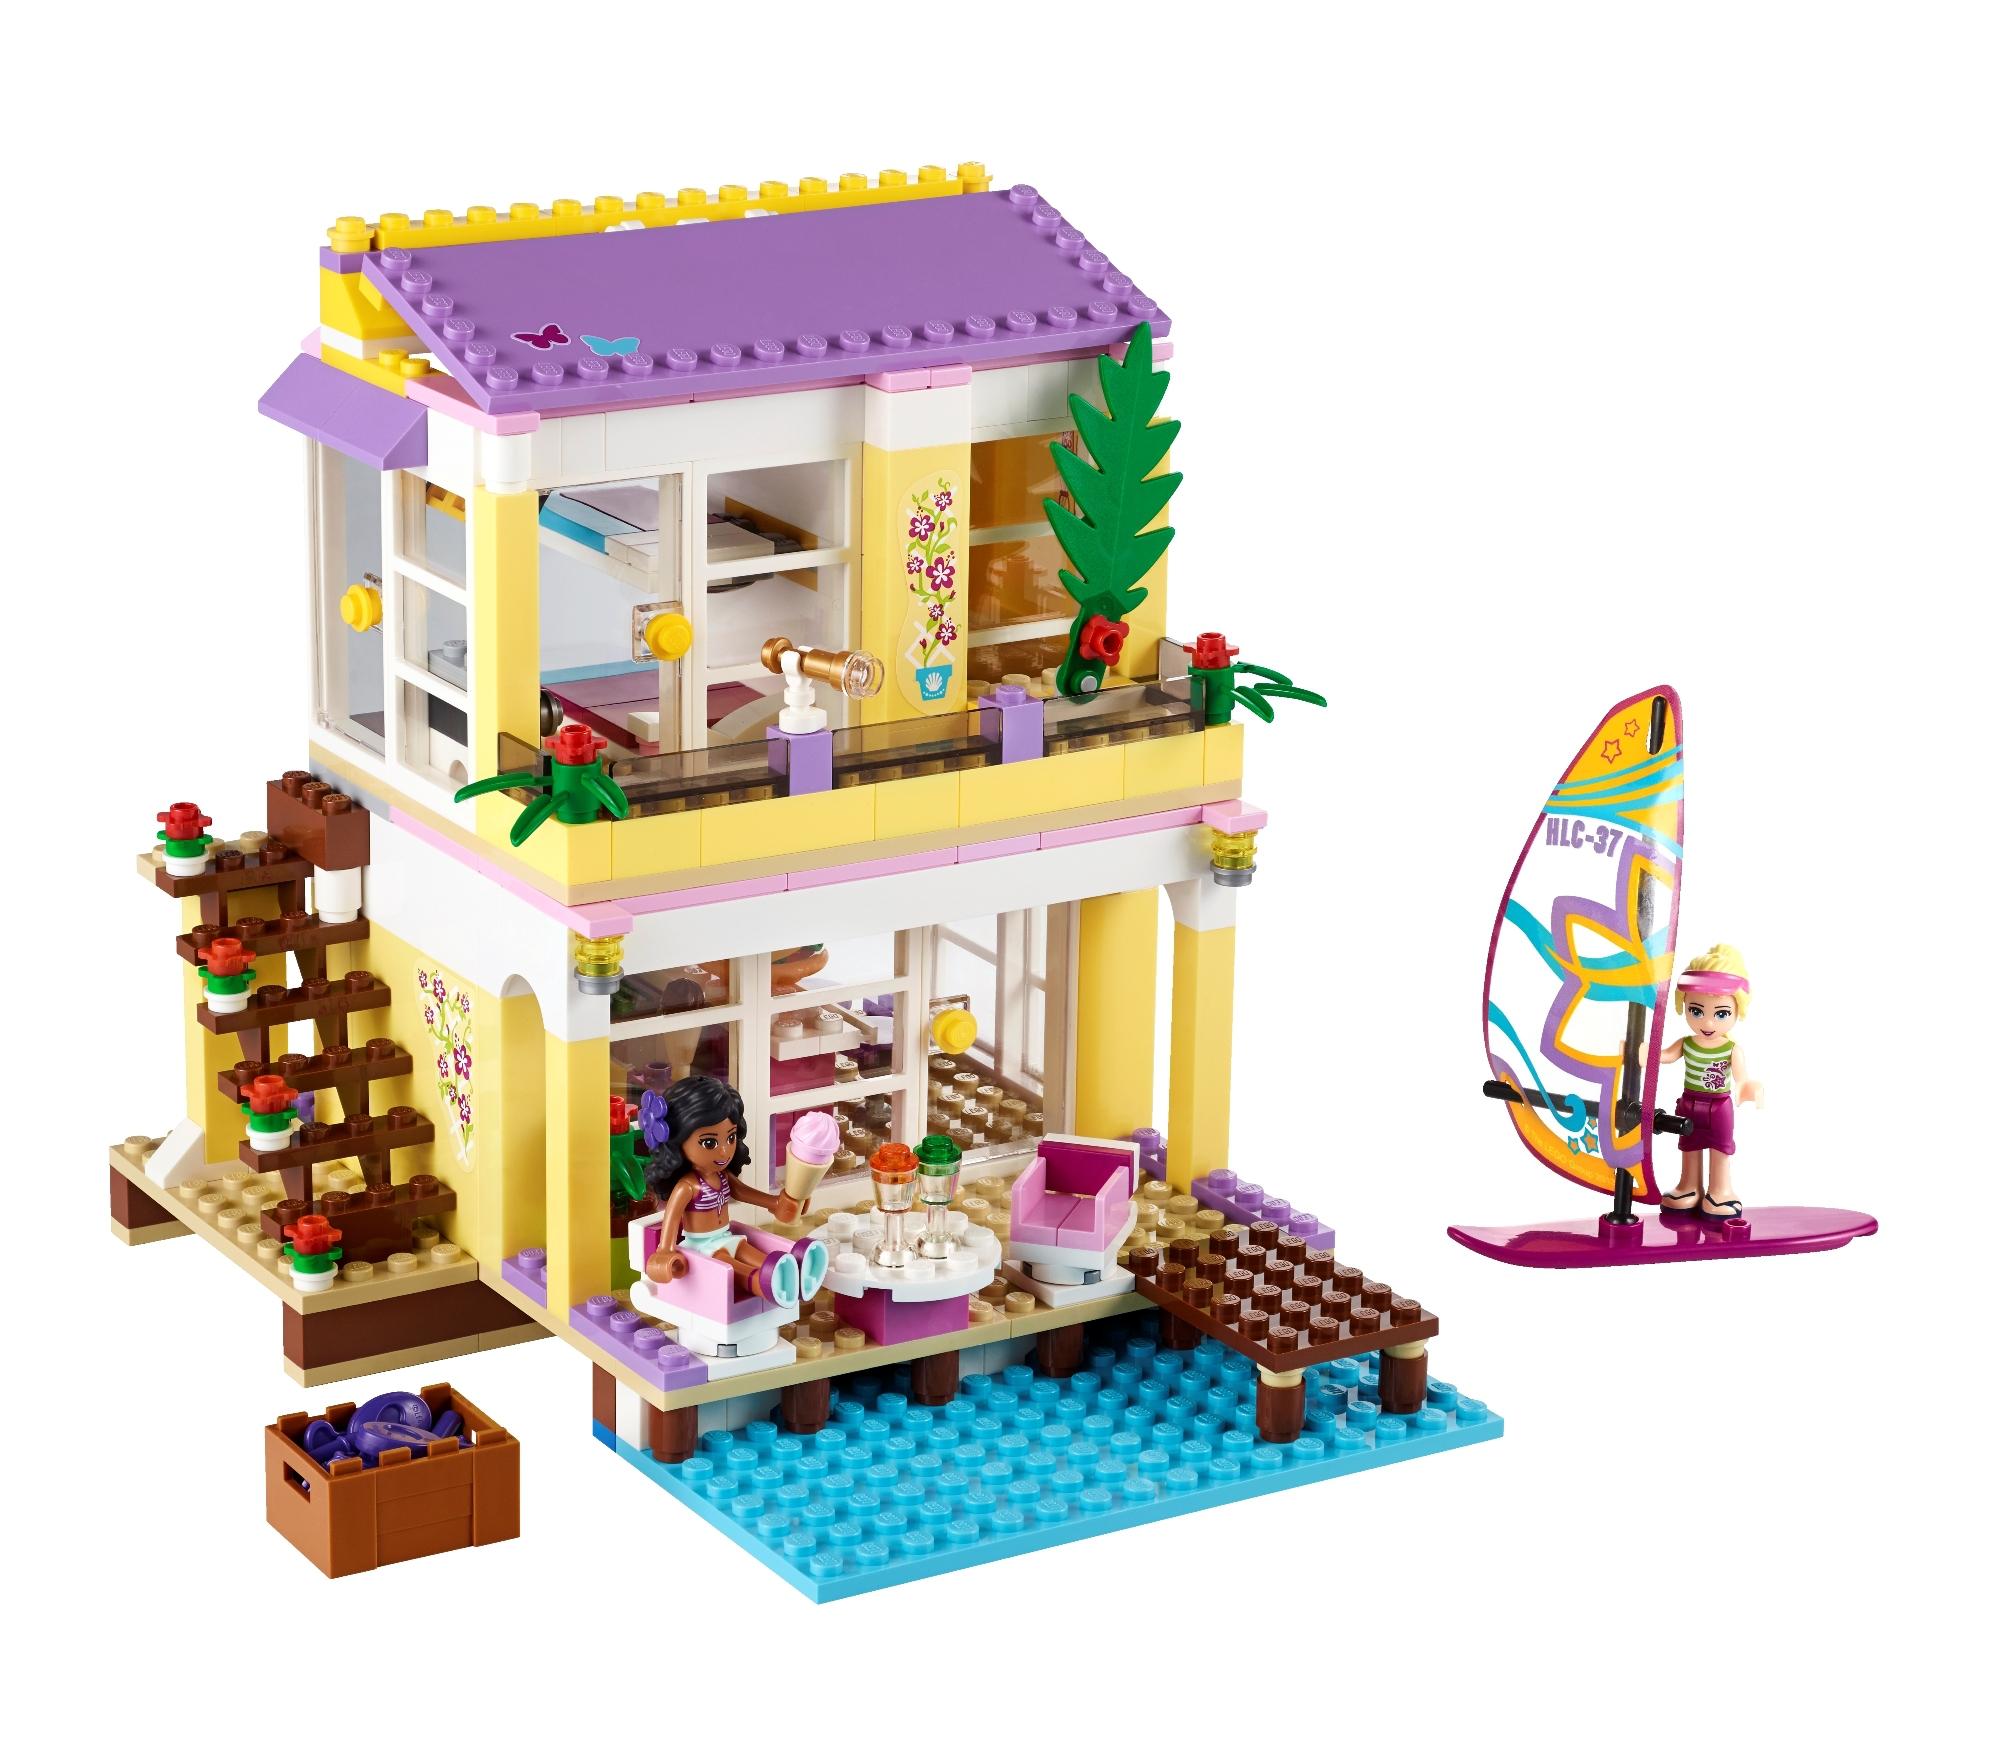 41037 la villa sur la plage wiki lego fandom powered for La maison d harmony